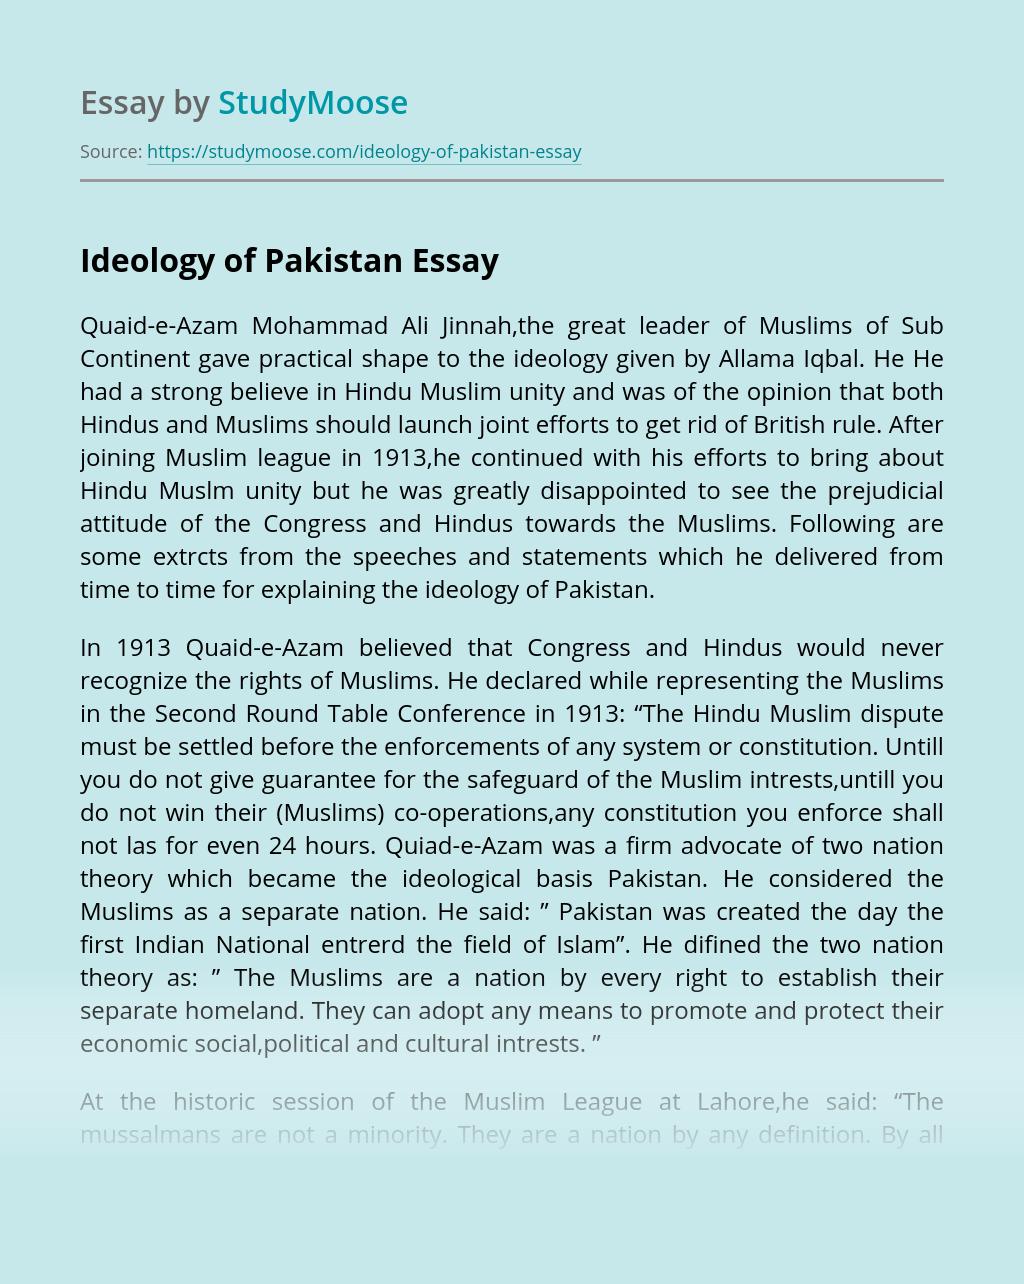 Ideology of Pakistan